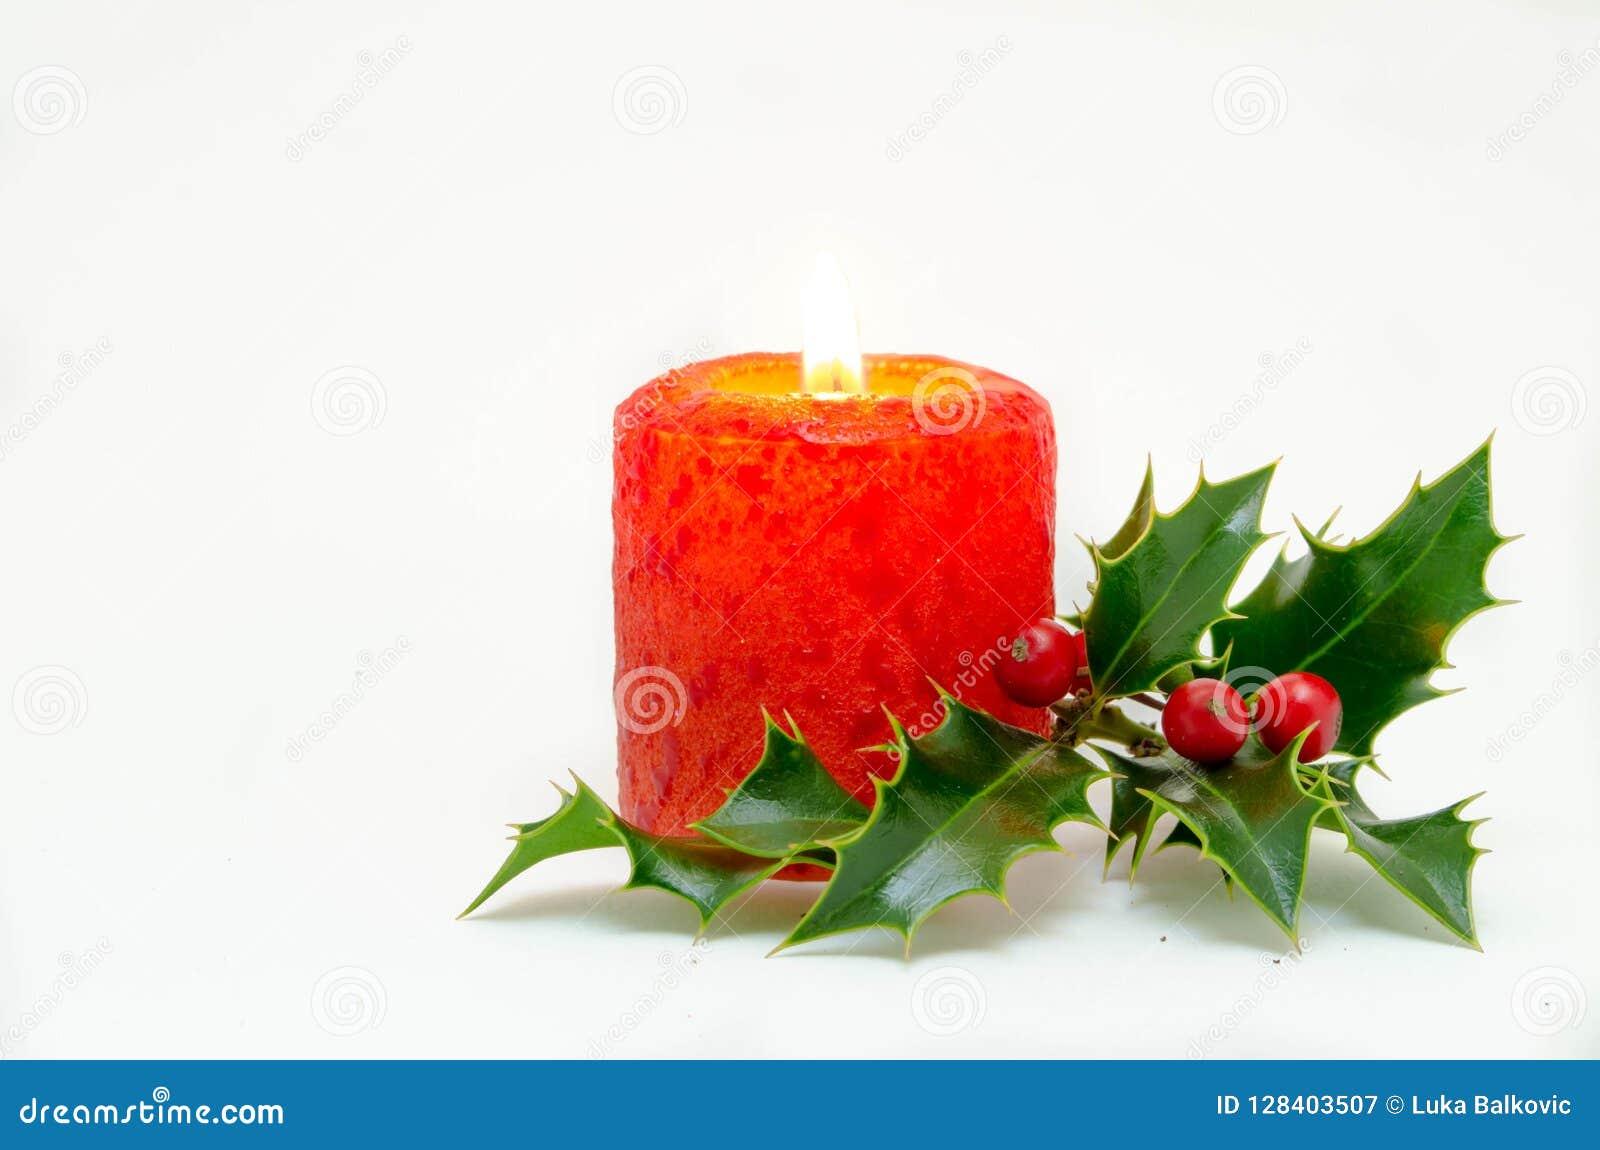 Ornements de Noël - bougie rouge et houx vert